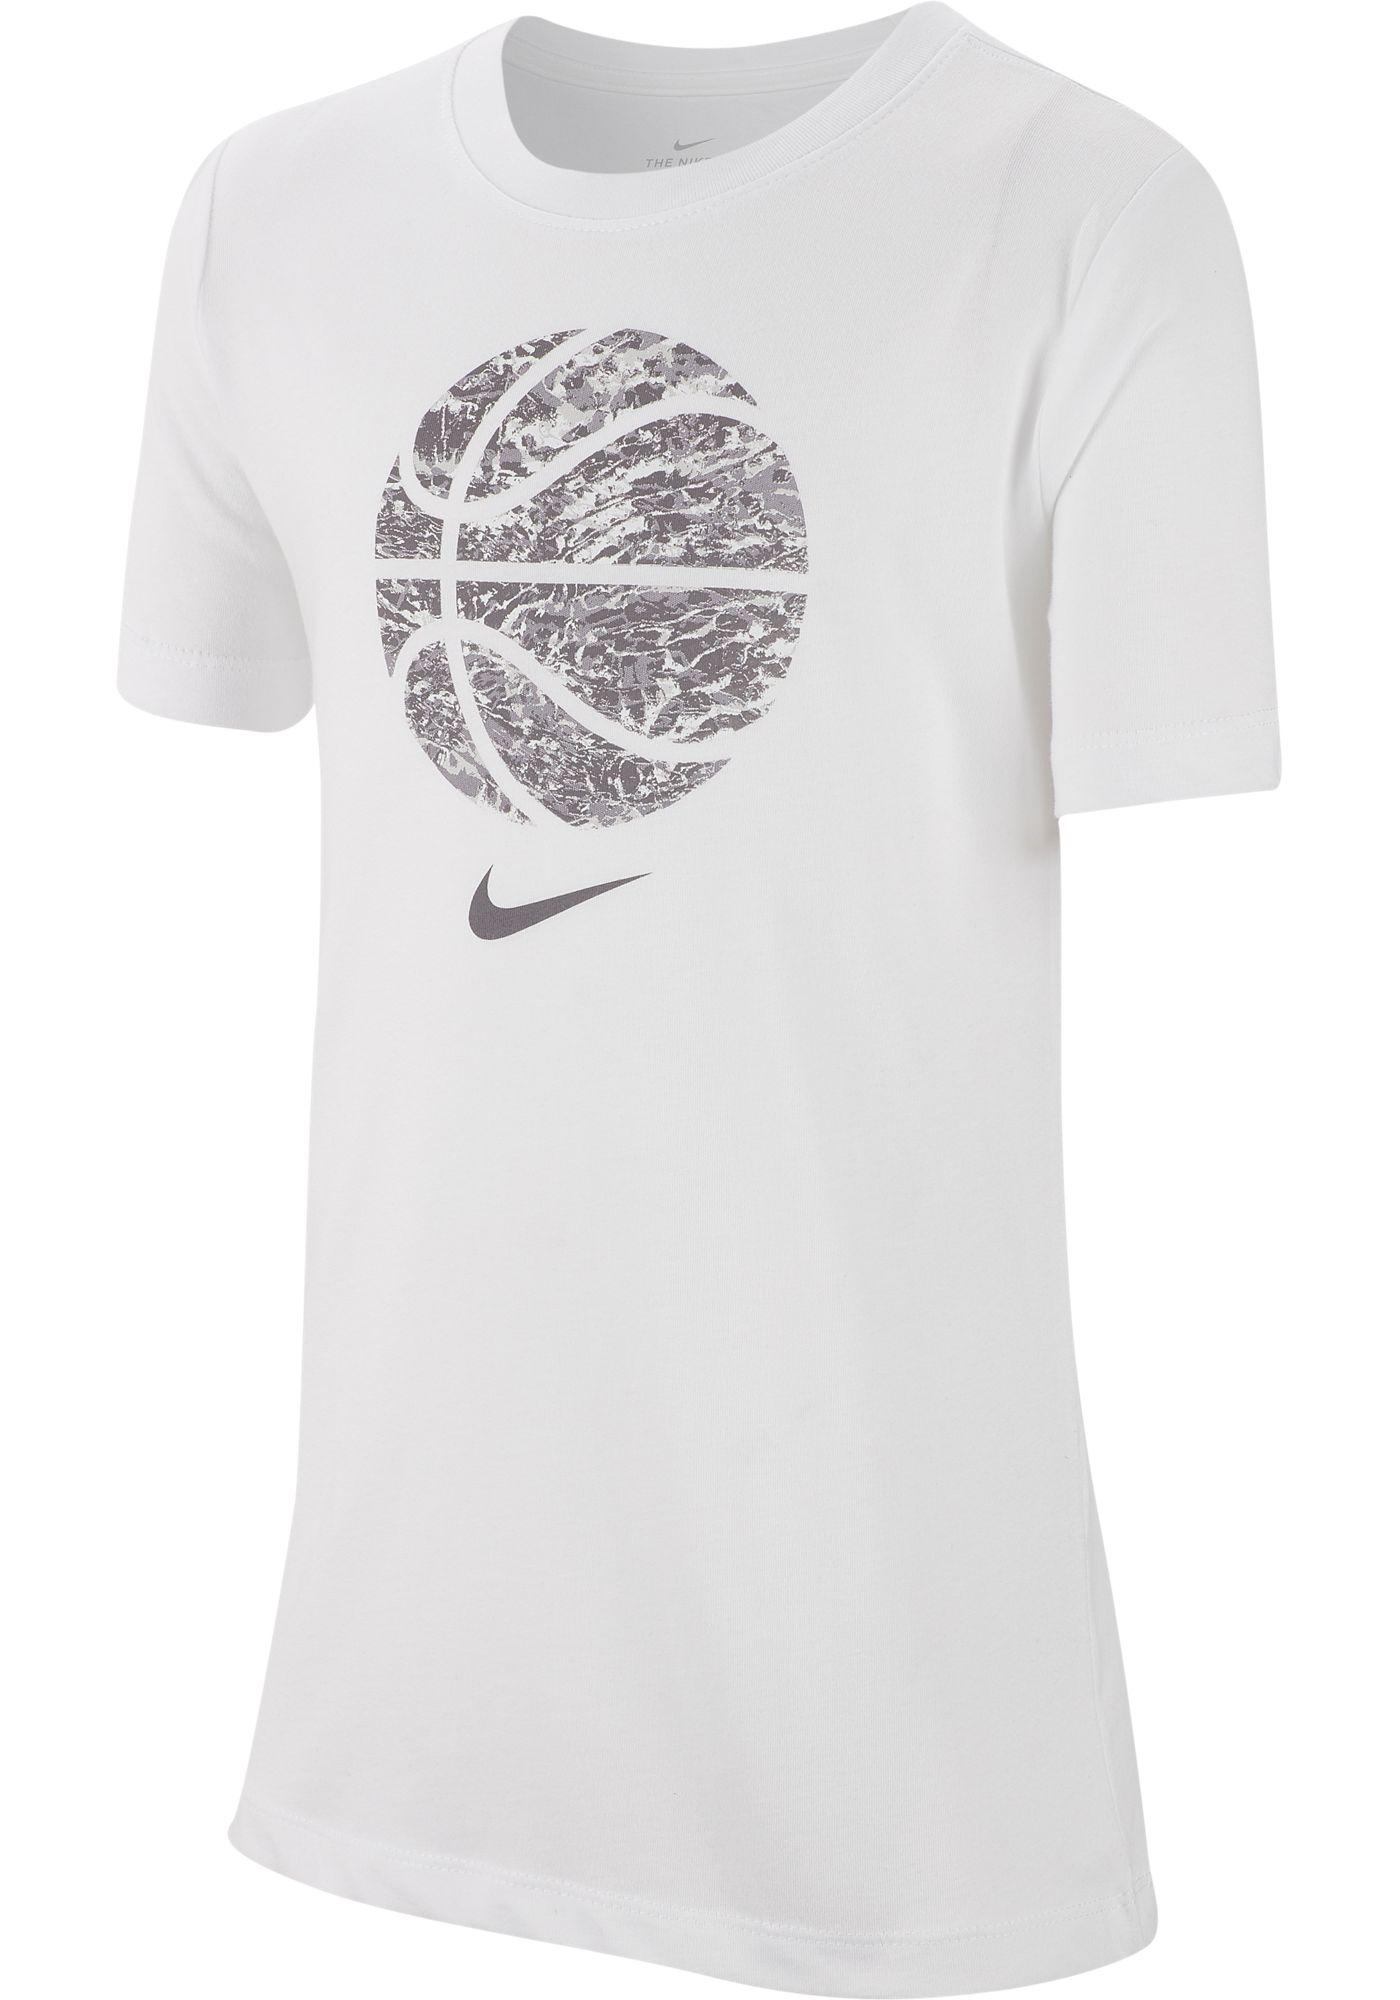 Nike Boys' Sportswear Basketball Print Fill Graphic Tee